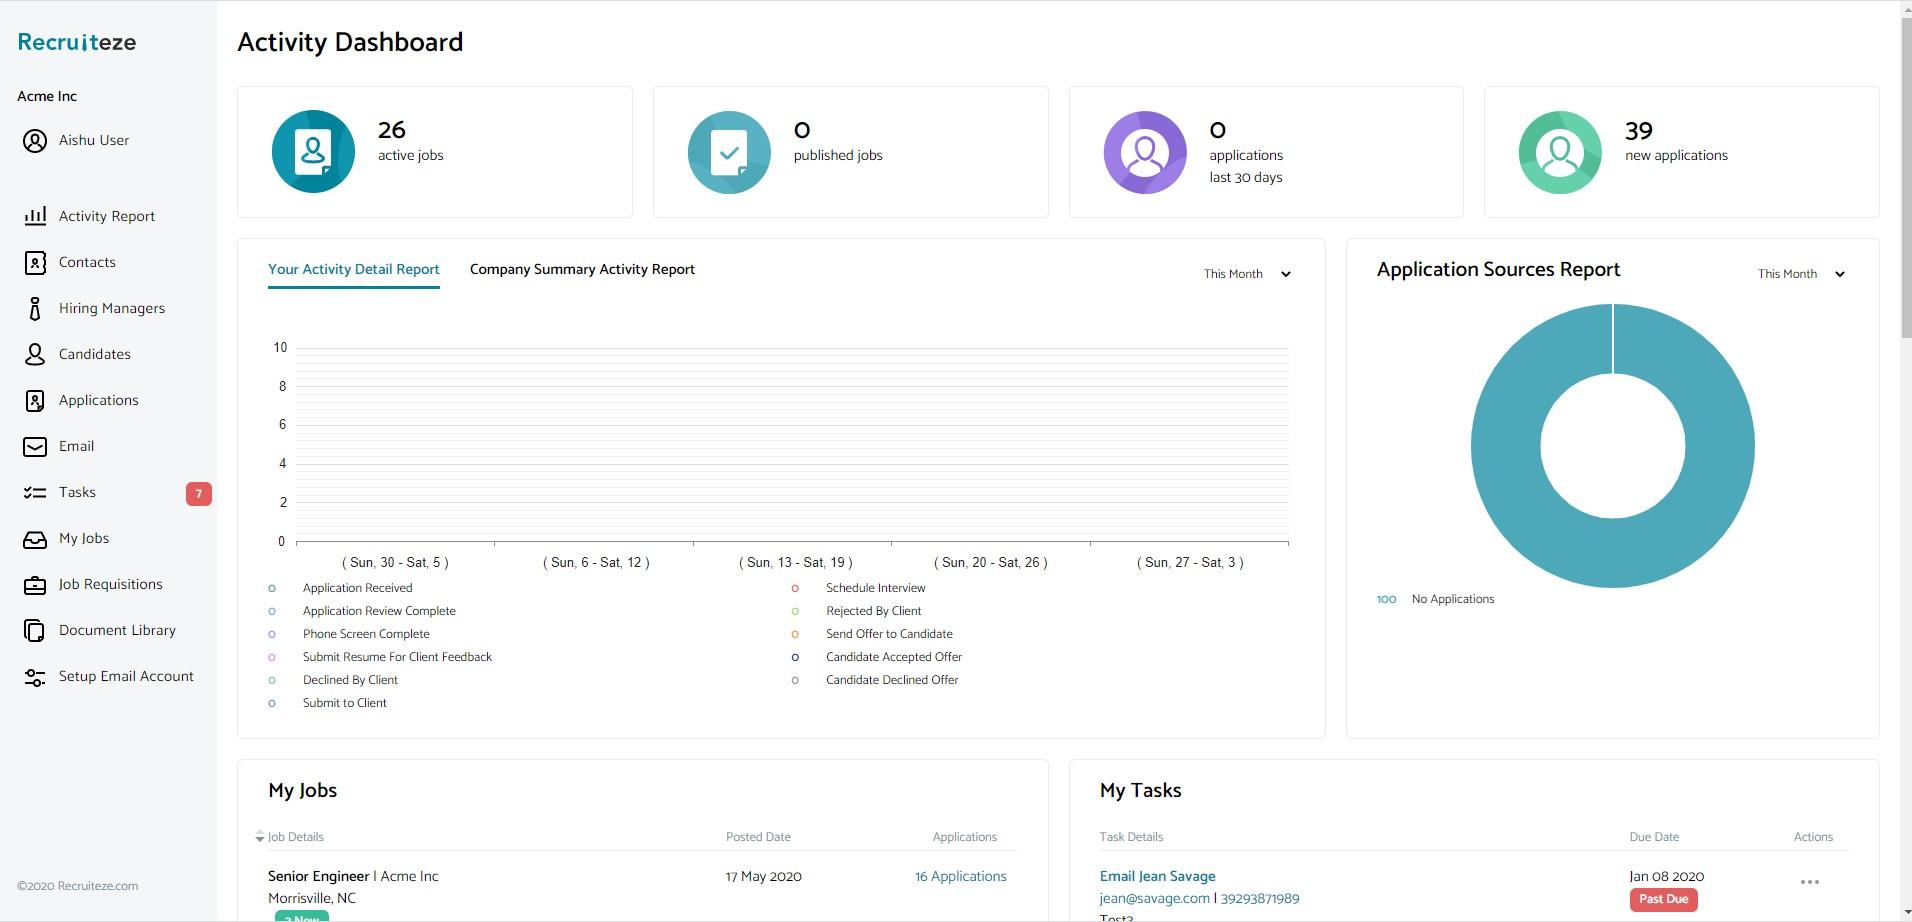 Recruiteze: User Dashboard